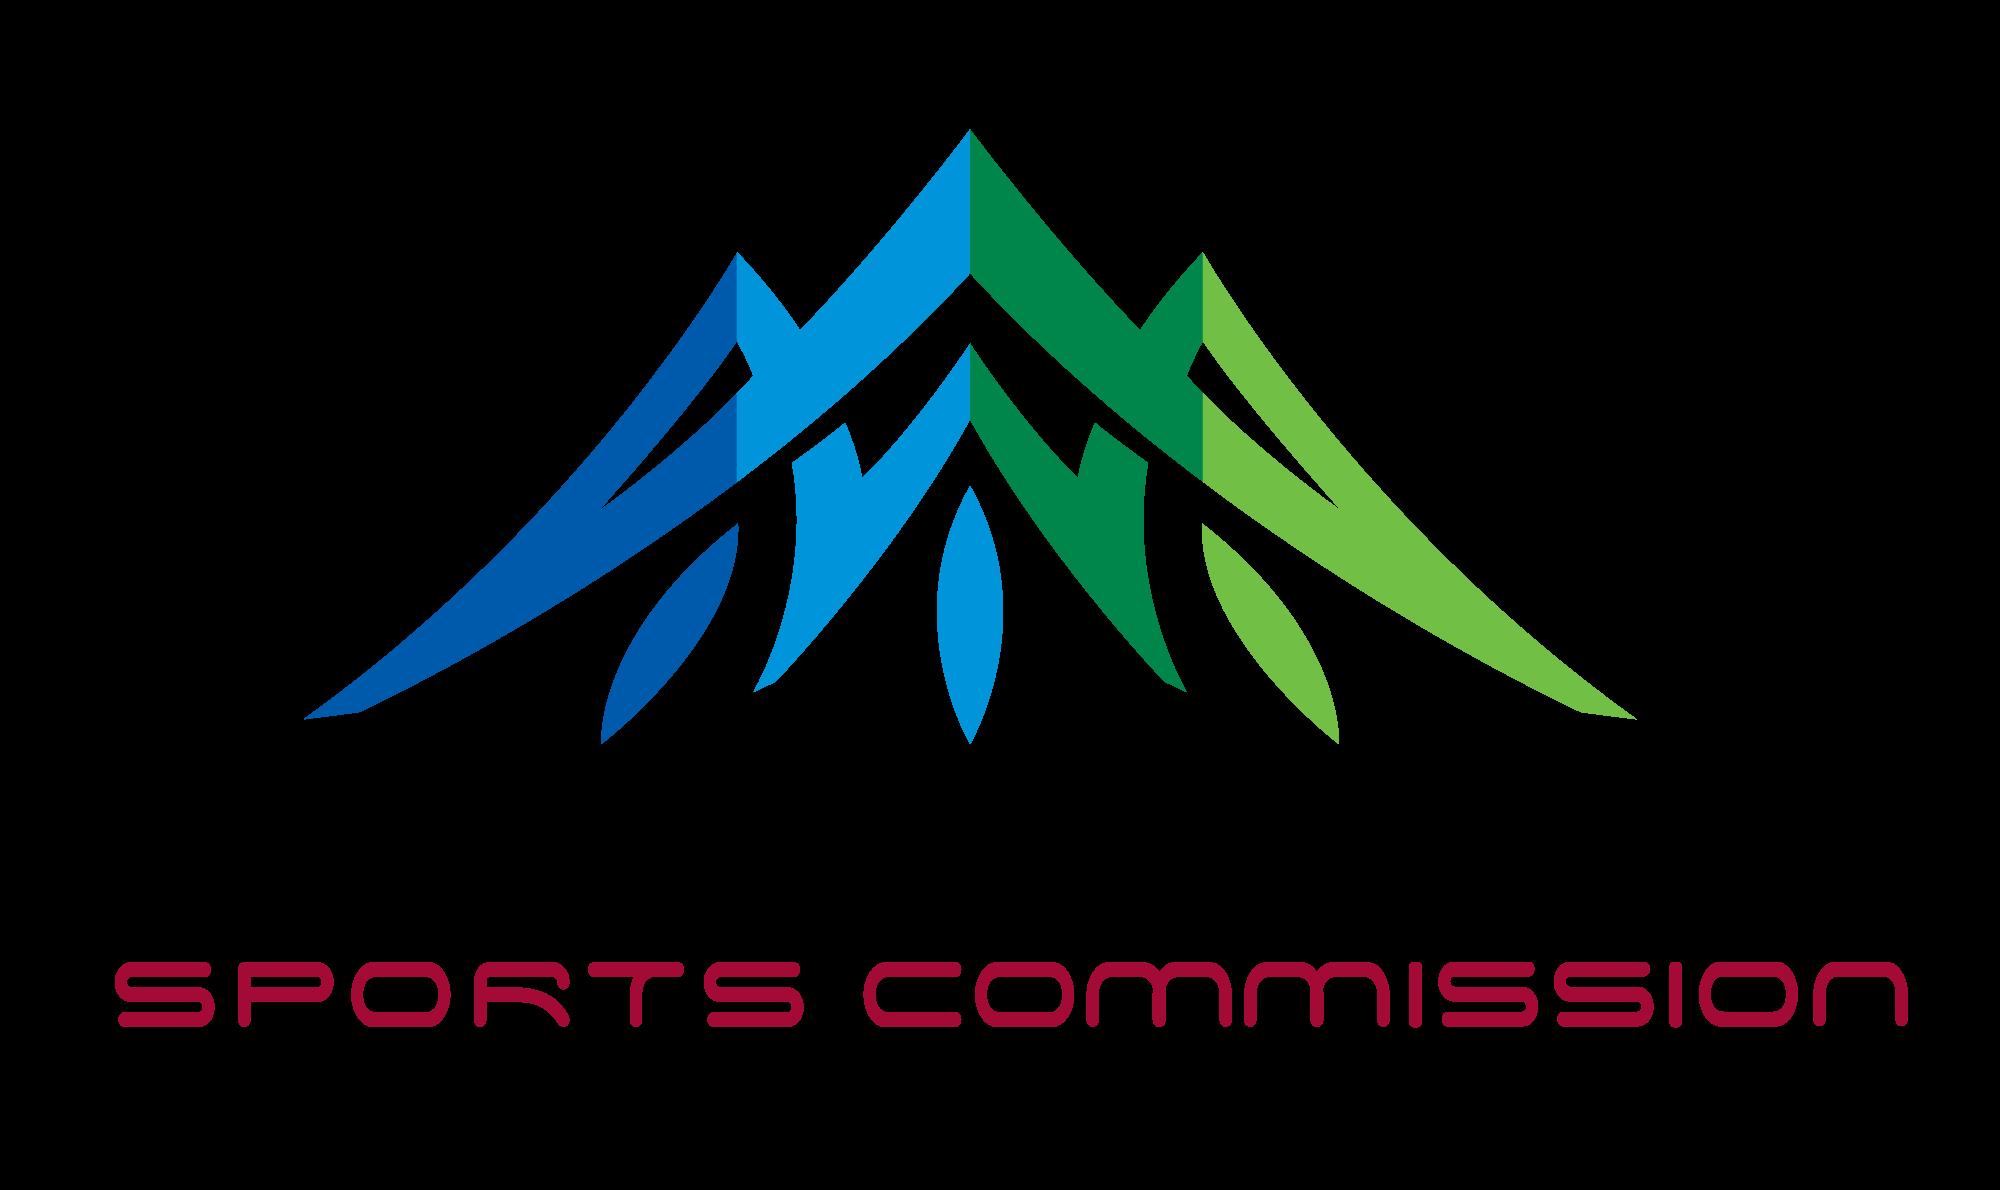 Sports_Commission_hi-res_noaffiliate.png